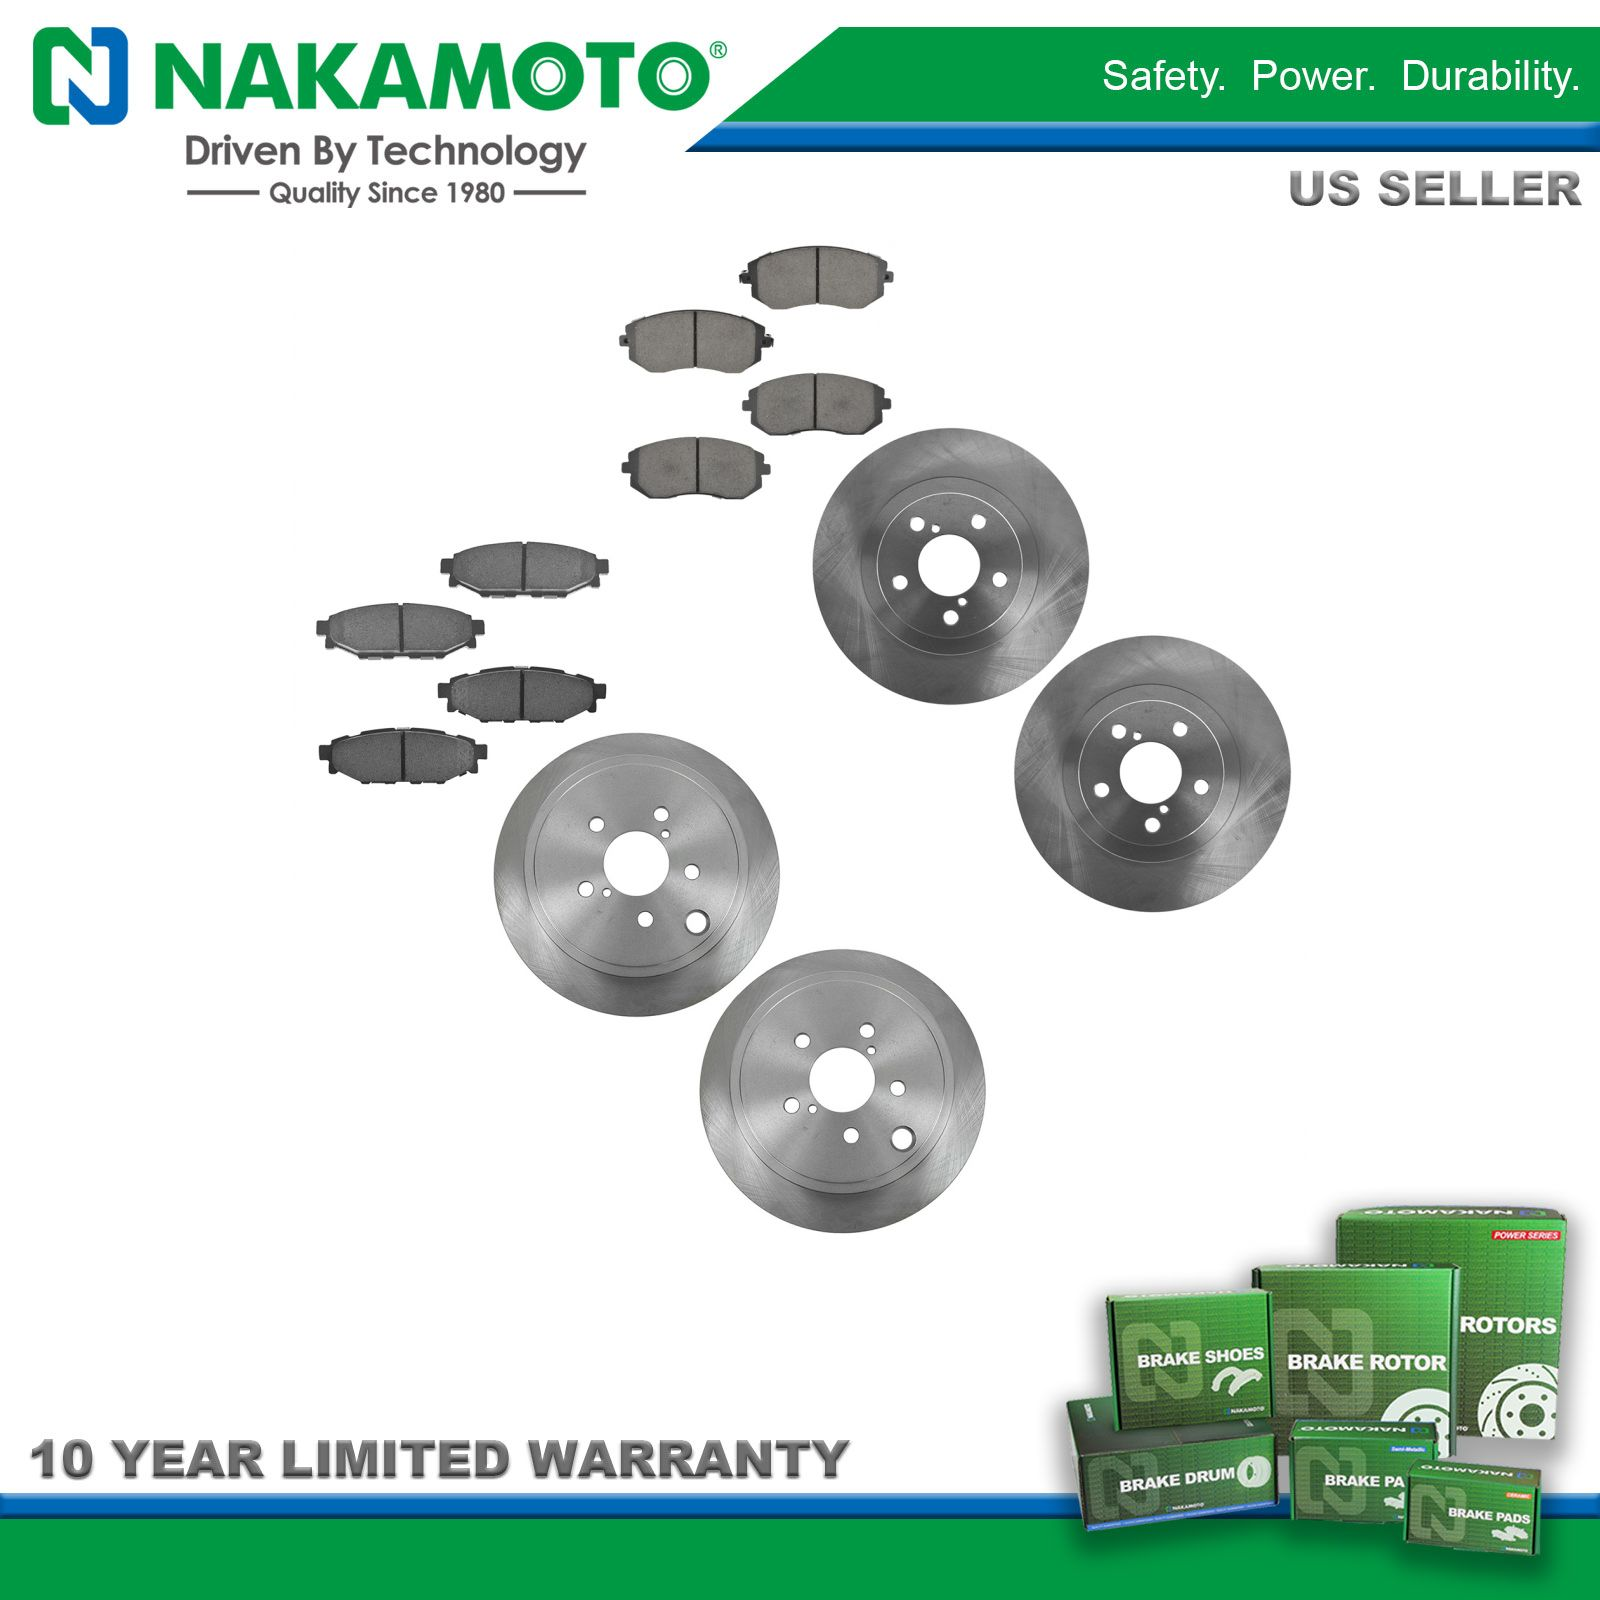 Nakamoto Premium Posi Ceramic Brake Pad & Rotor Kit Front & Rear Set for Subaru